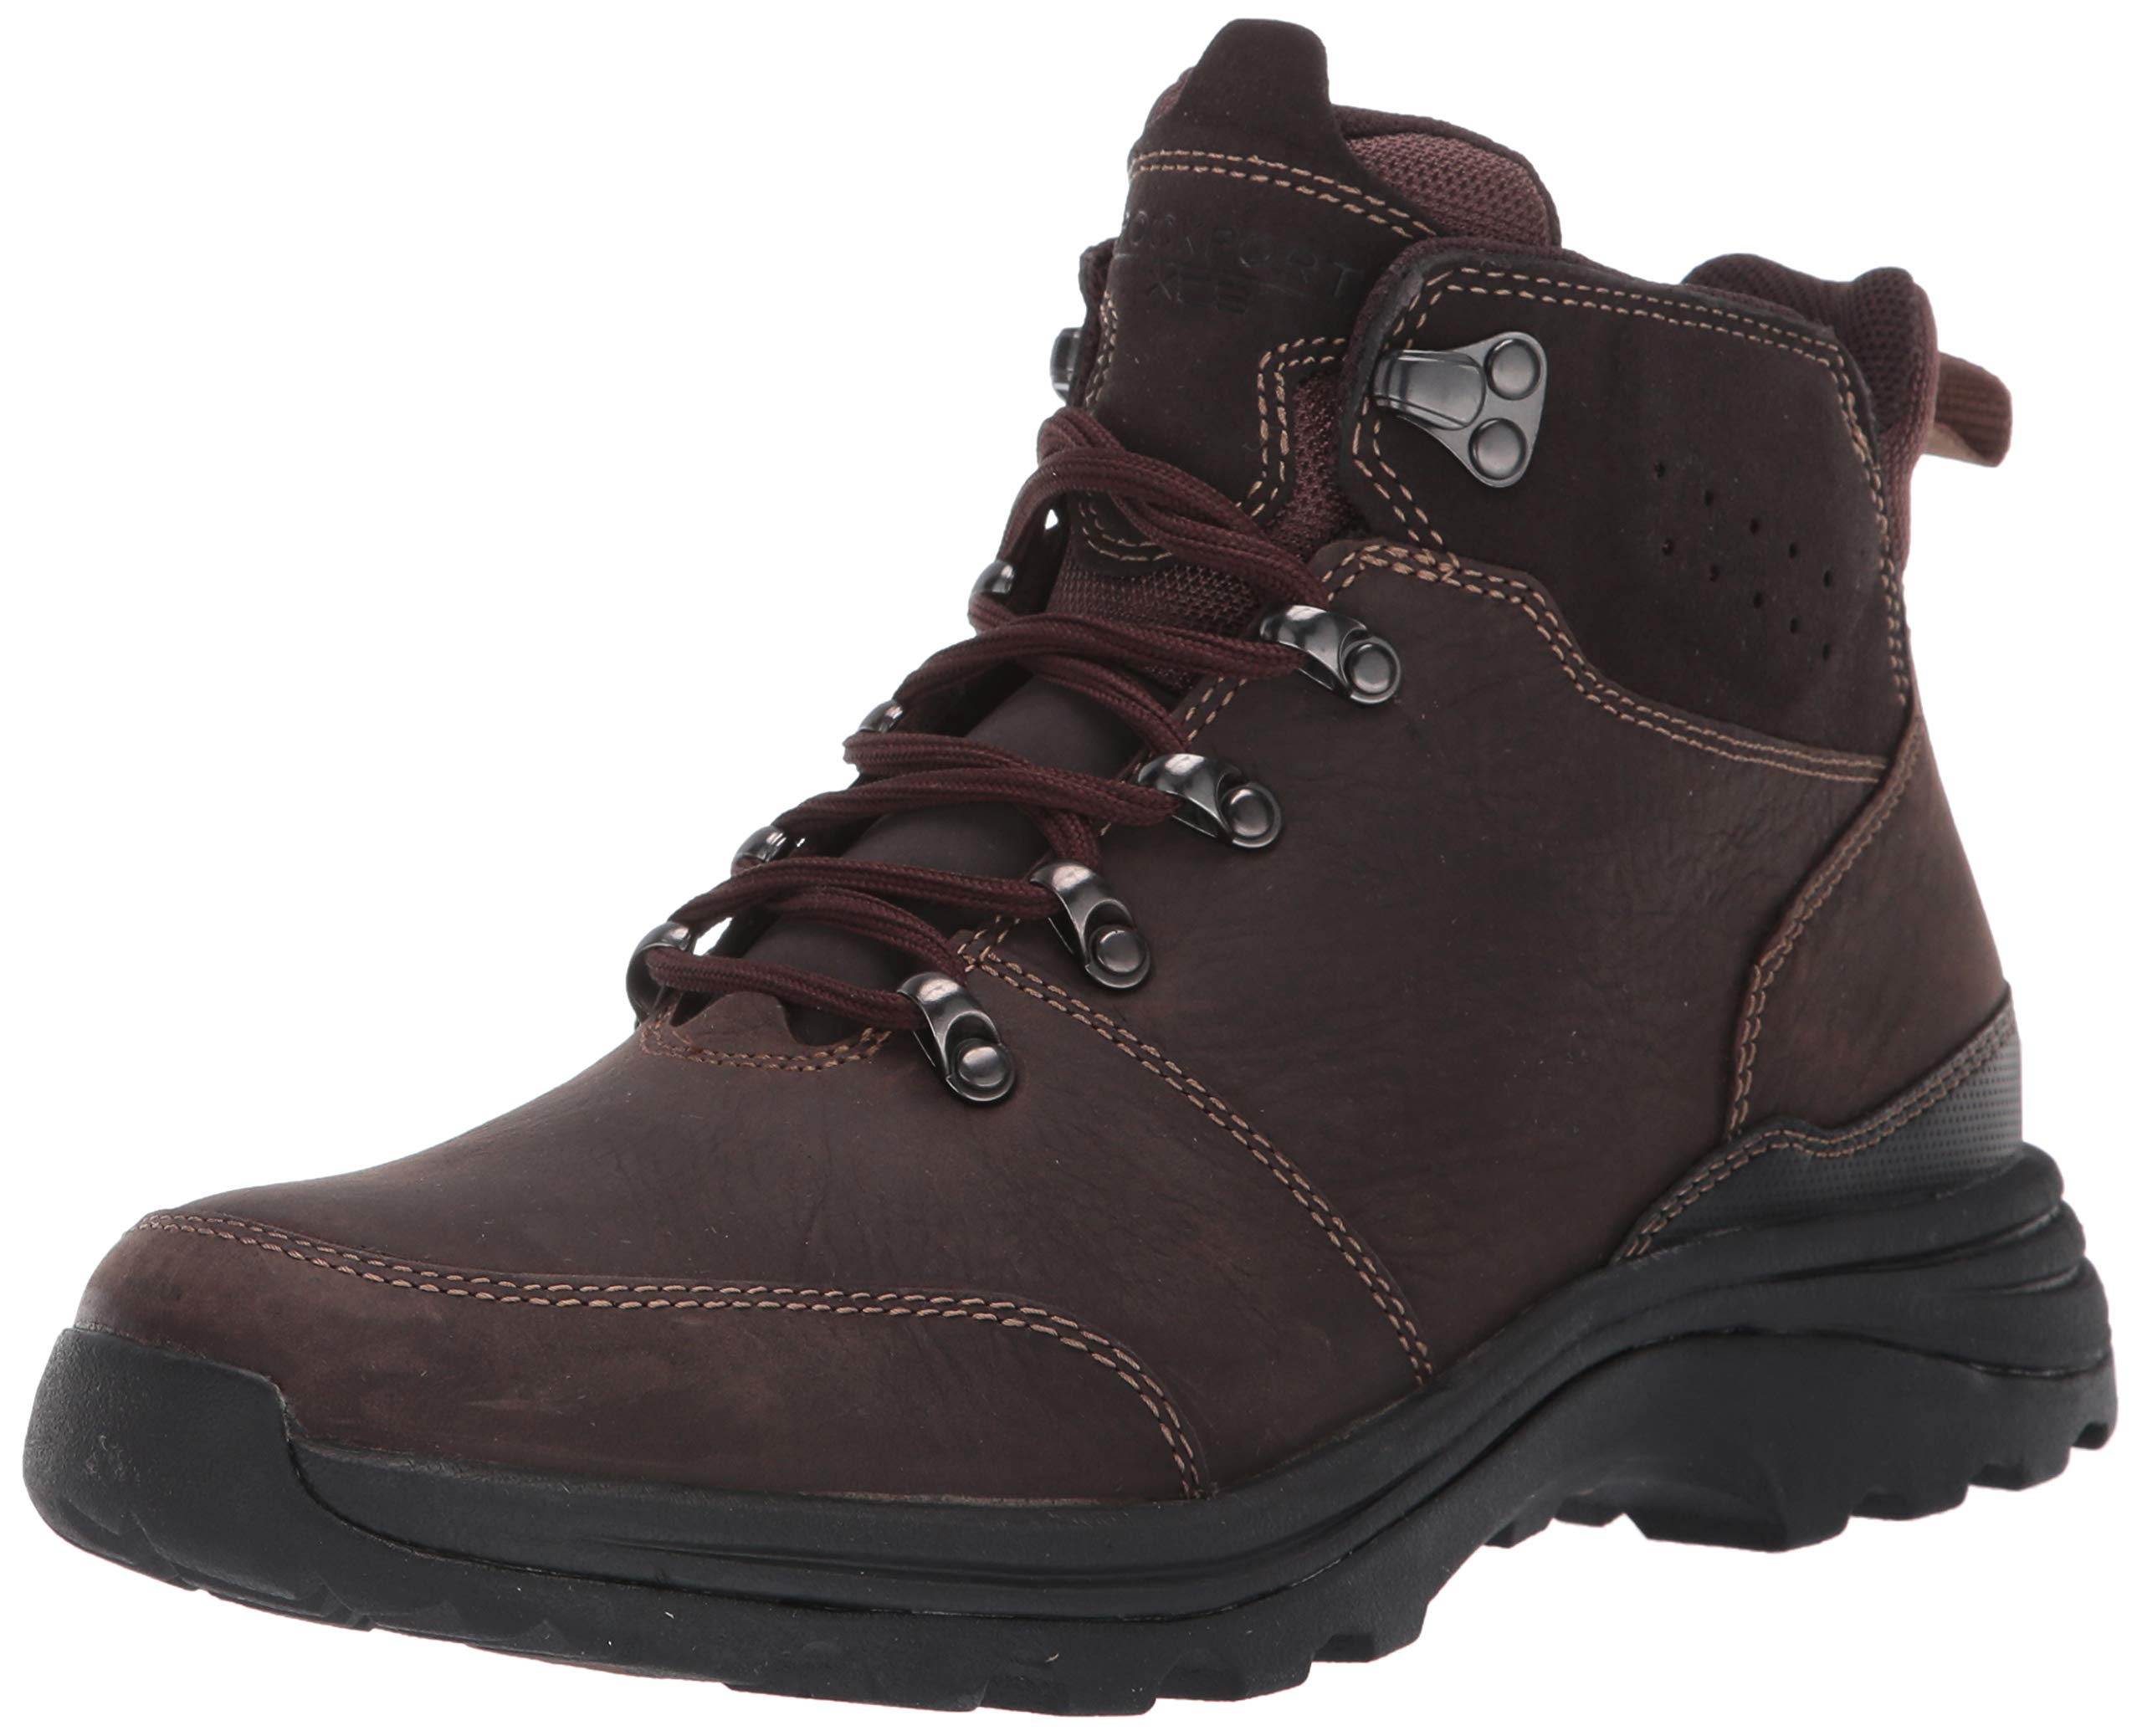 Rockport Mens Mudguard Boots Brown